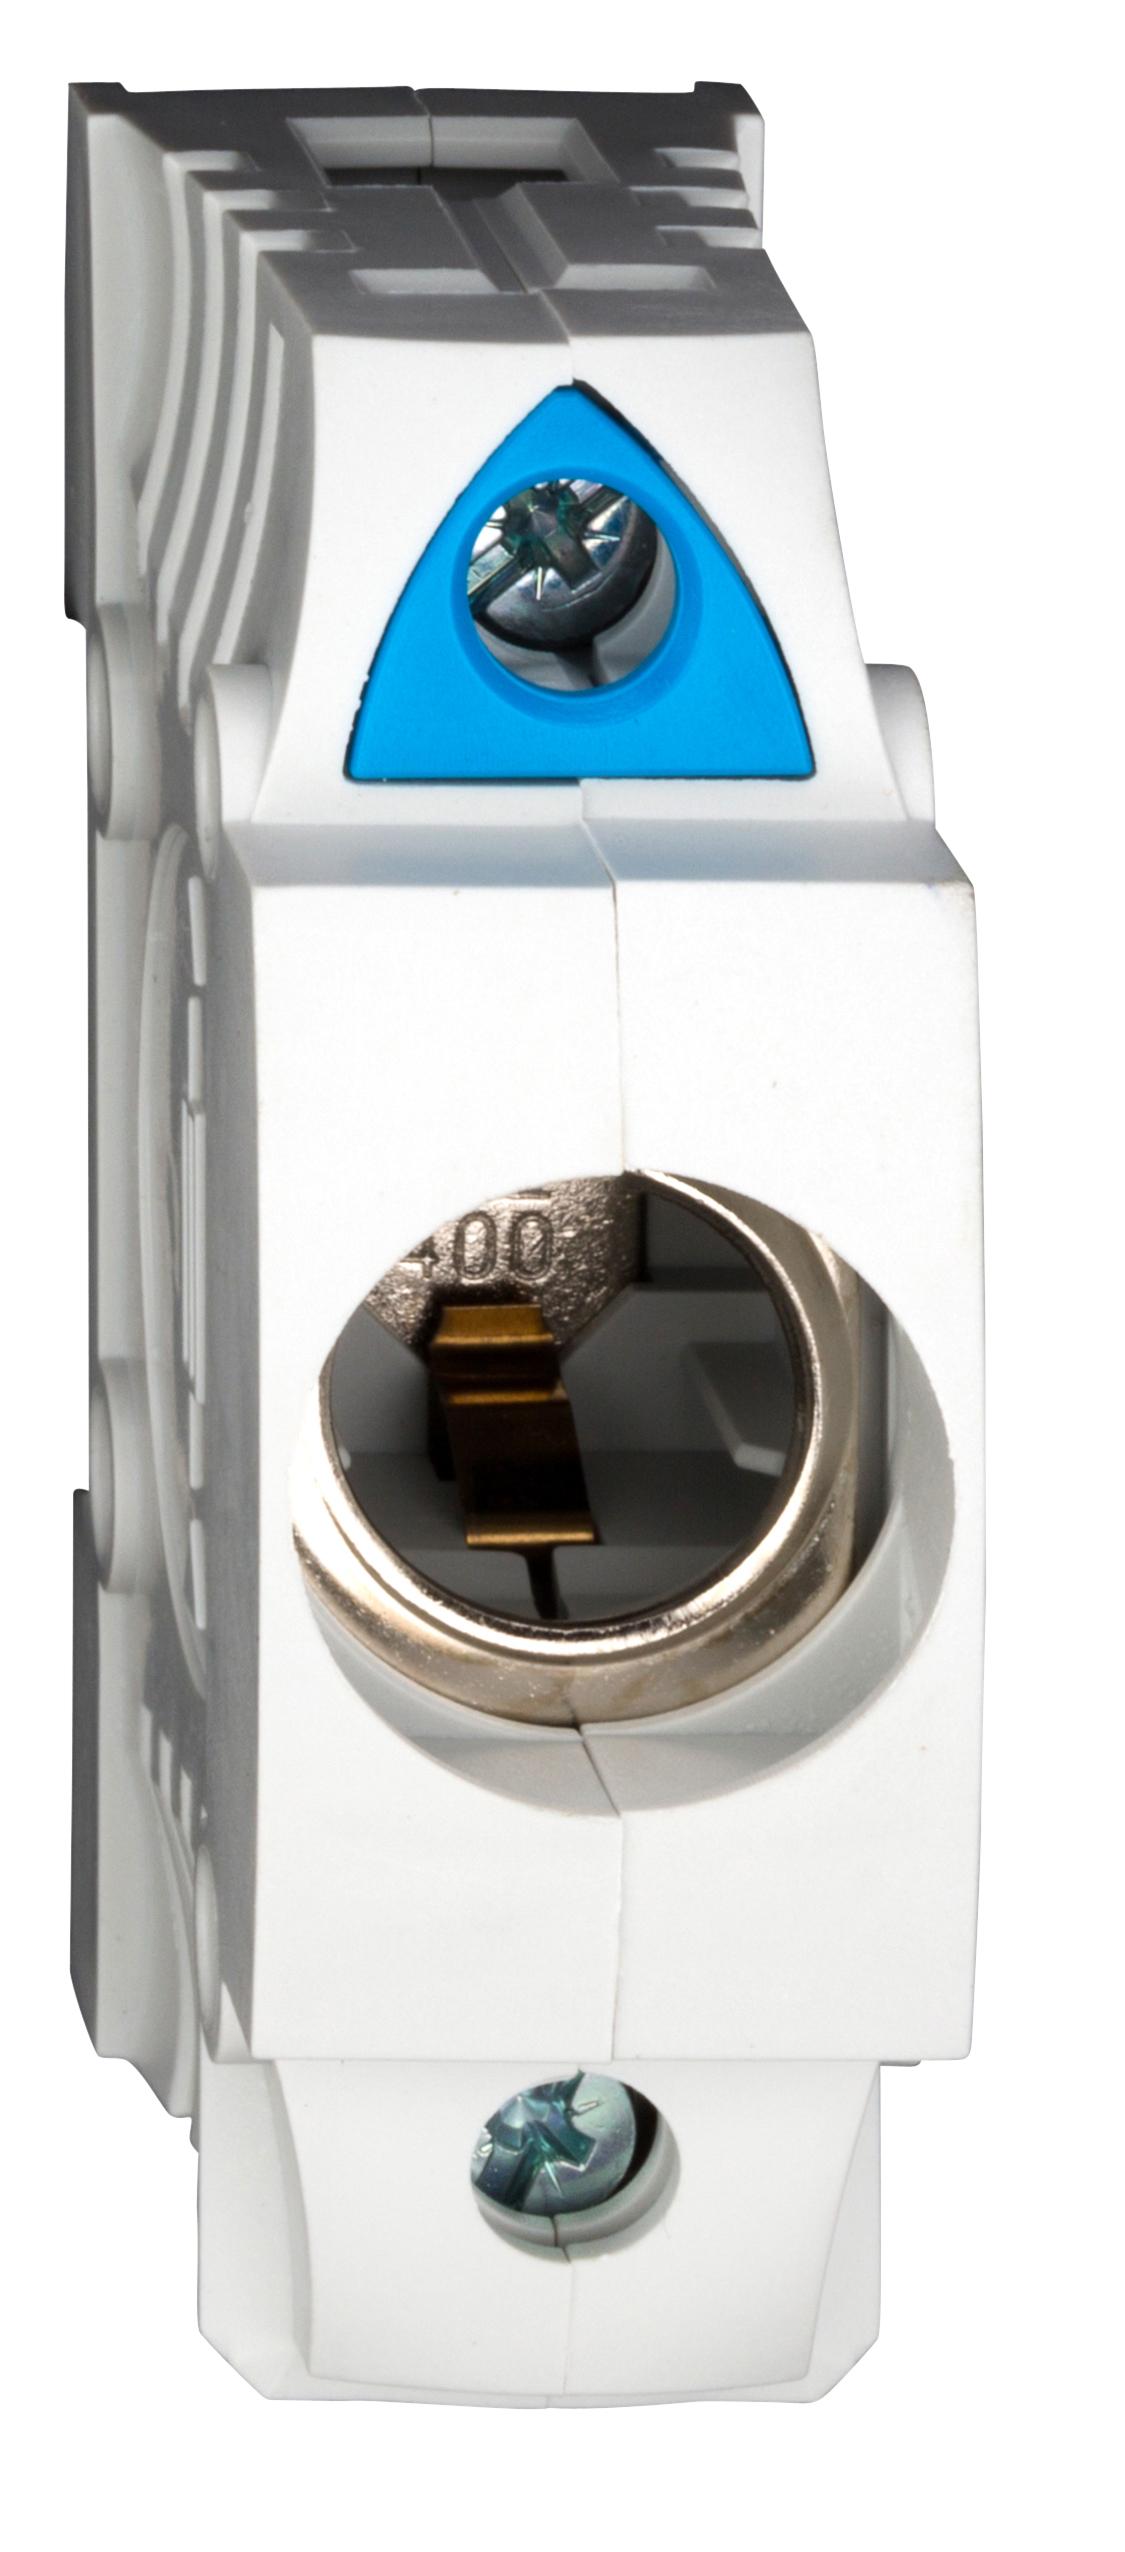 1 Stk D0-Einbau-Sicherungssockel D02, 1-polig, BGV A3, schnappbar SI312910--